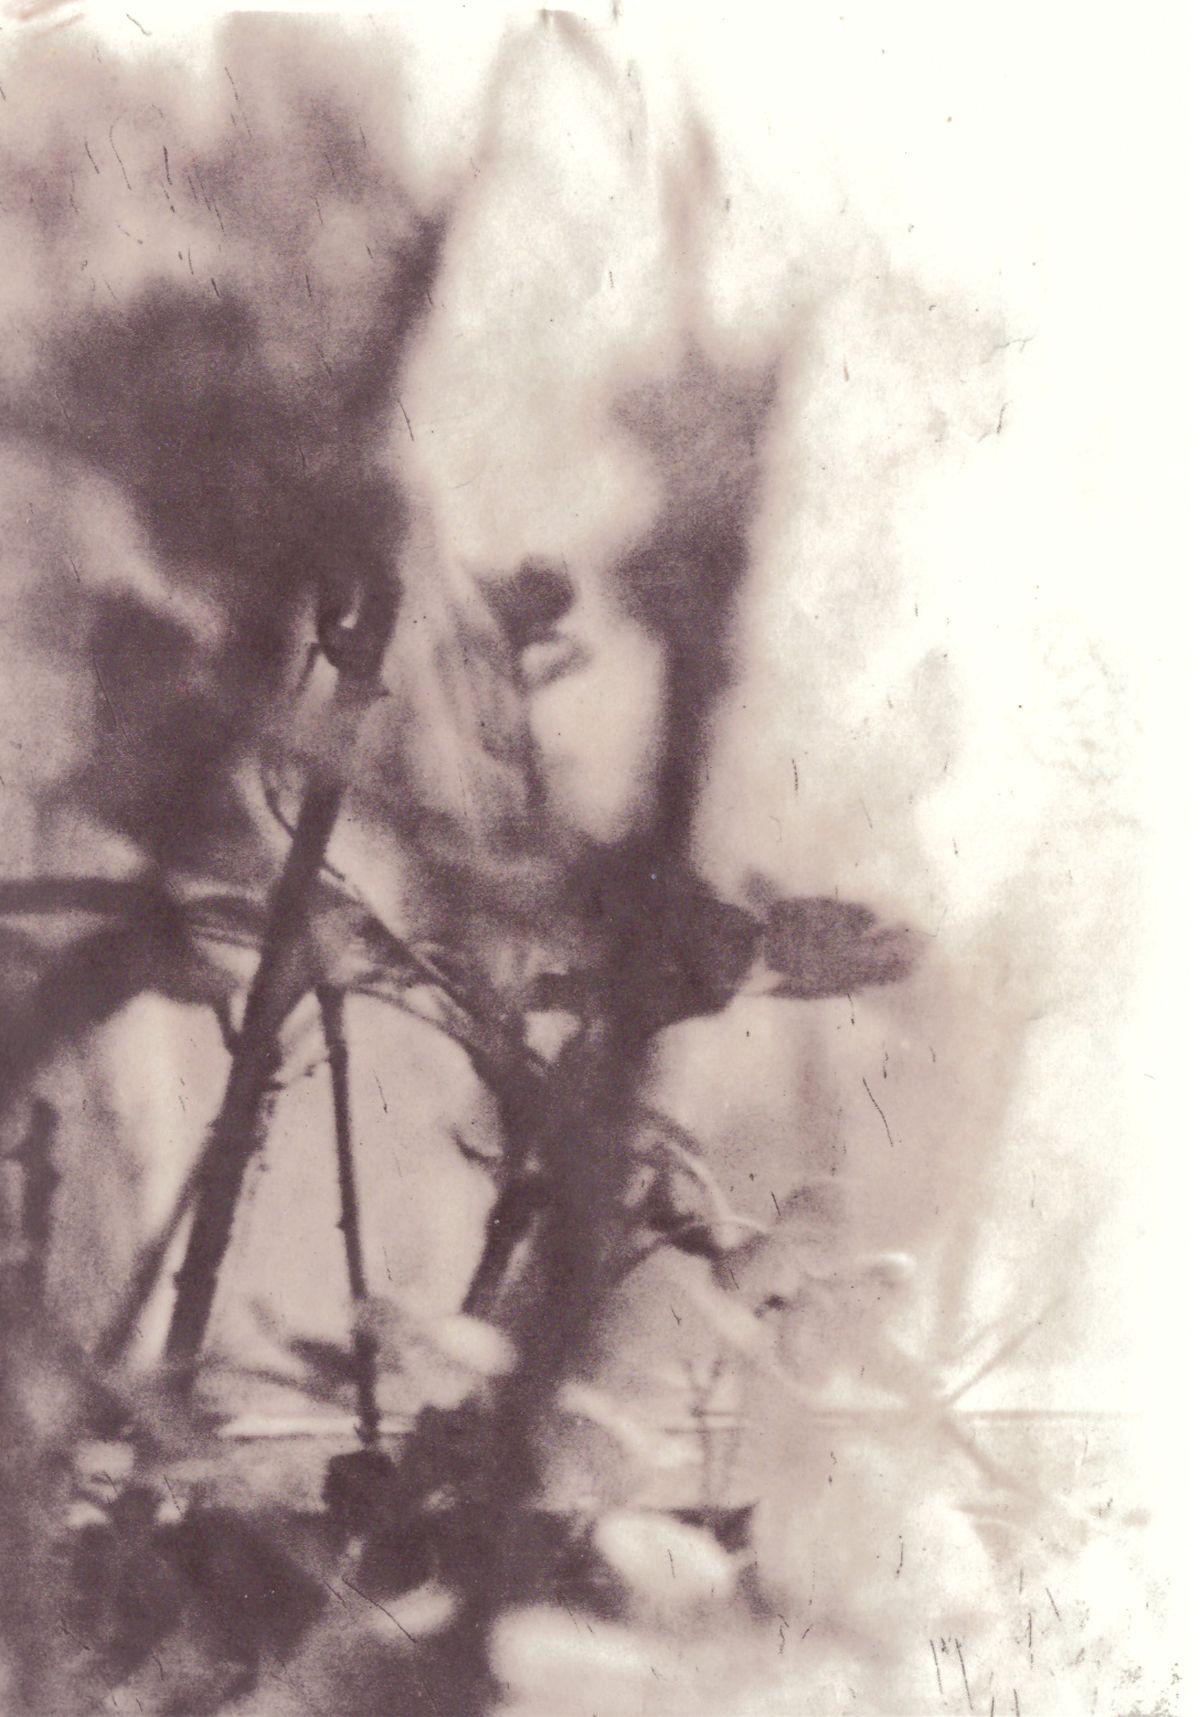 Hipsterhausen auf ORWO-Dokumentenpapier